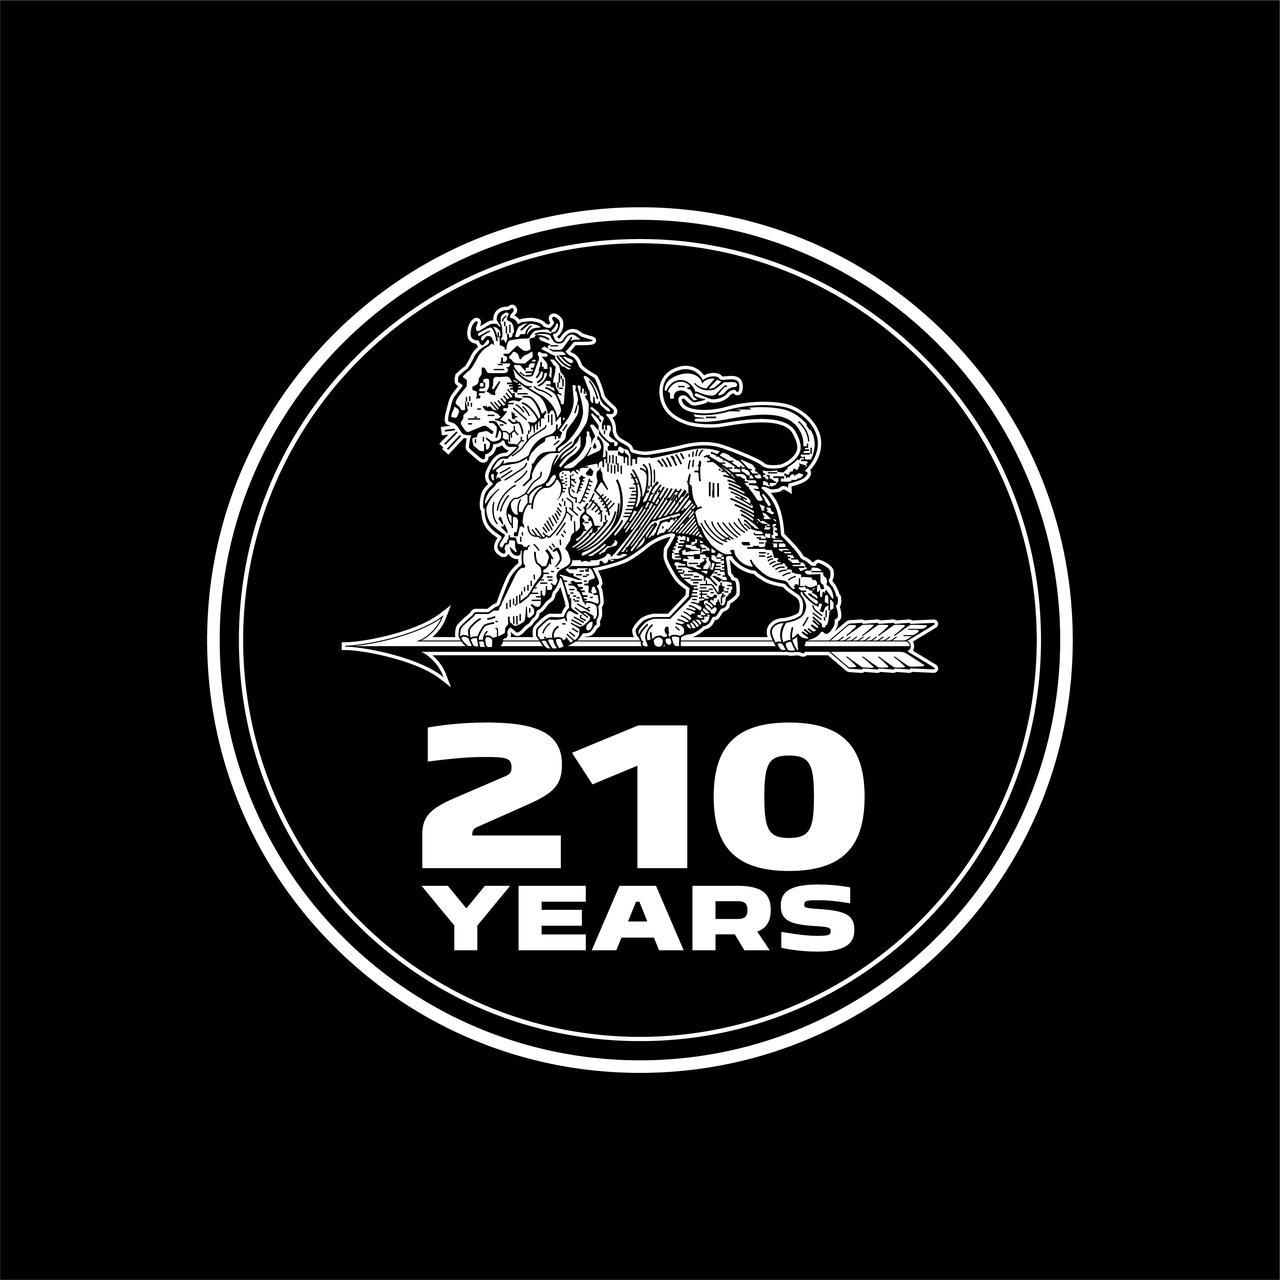 Images : 17番目の画像 - 「ジャンゴ 125 ABS 210周年リミテッドエディション」の写真を見る - LAWRENCE - Motorcycle x Cars + α = Your Life.